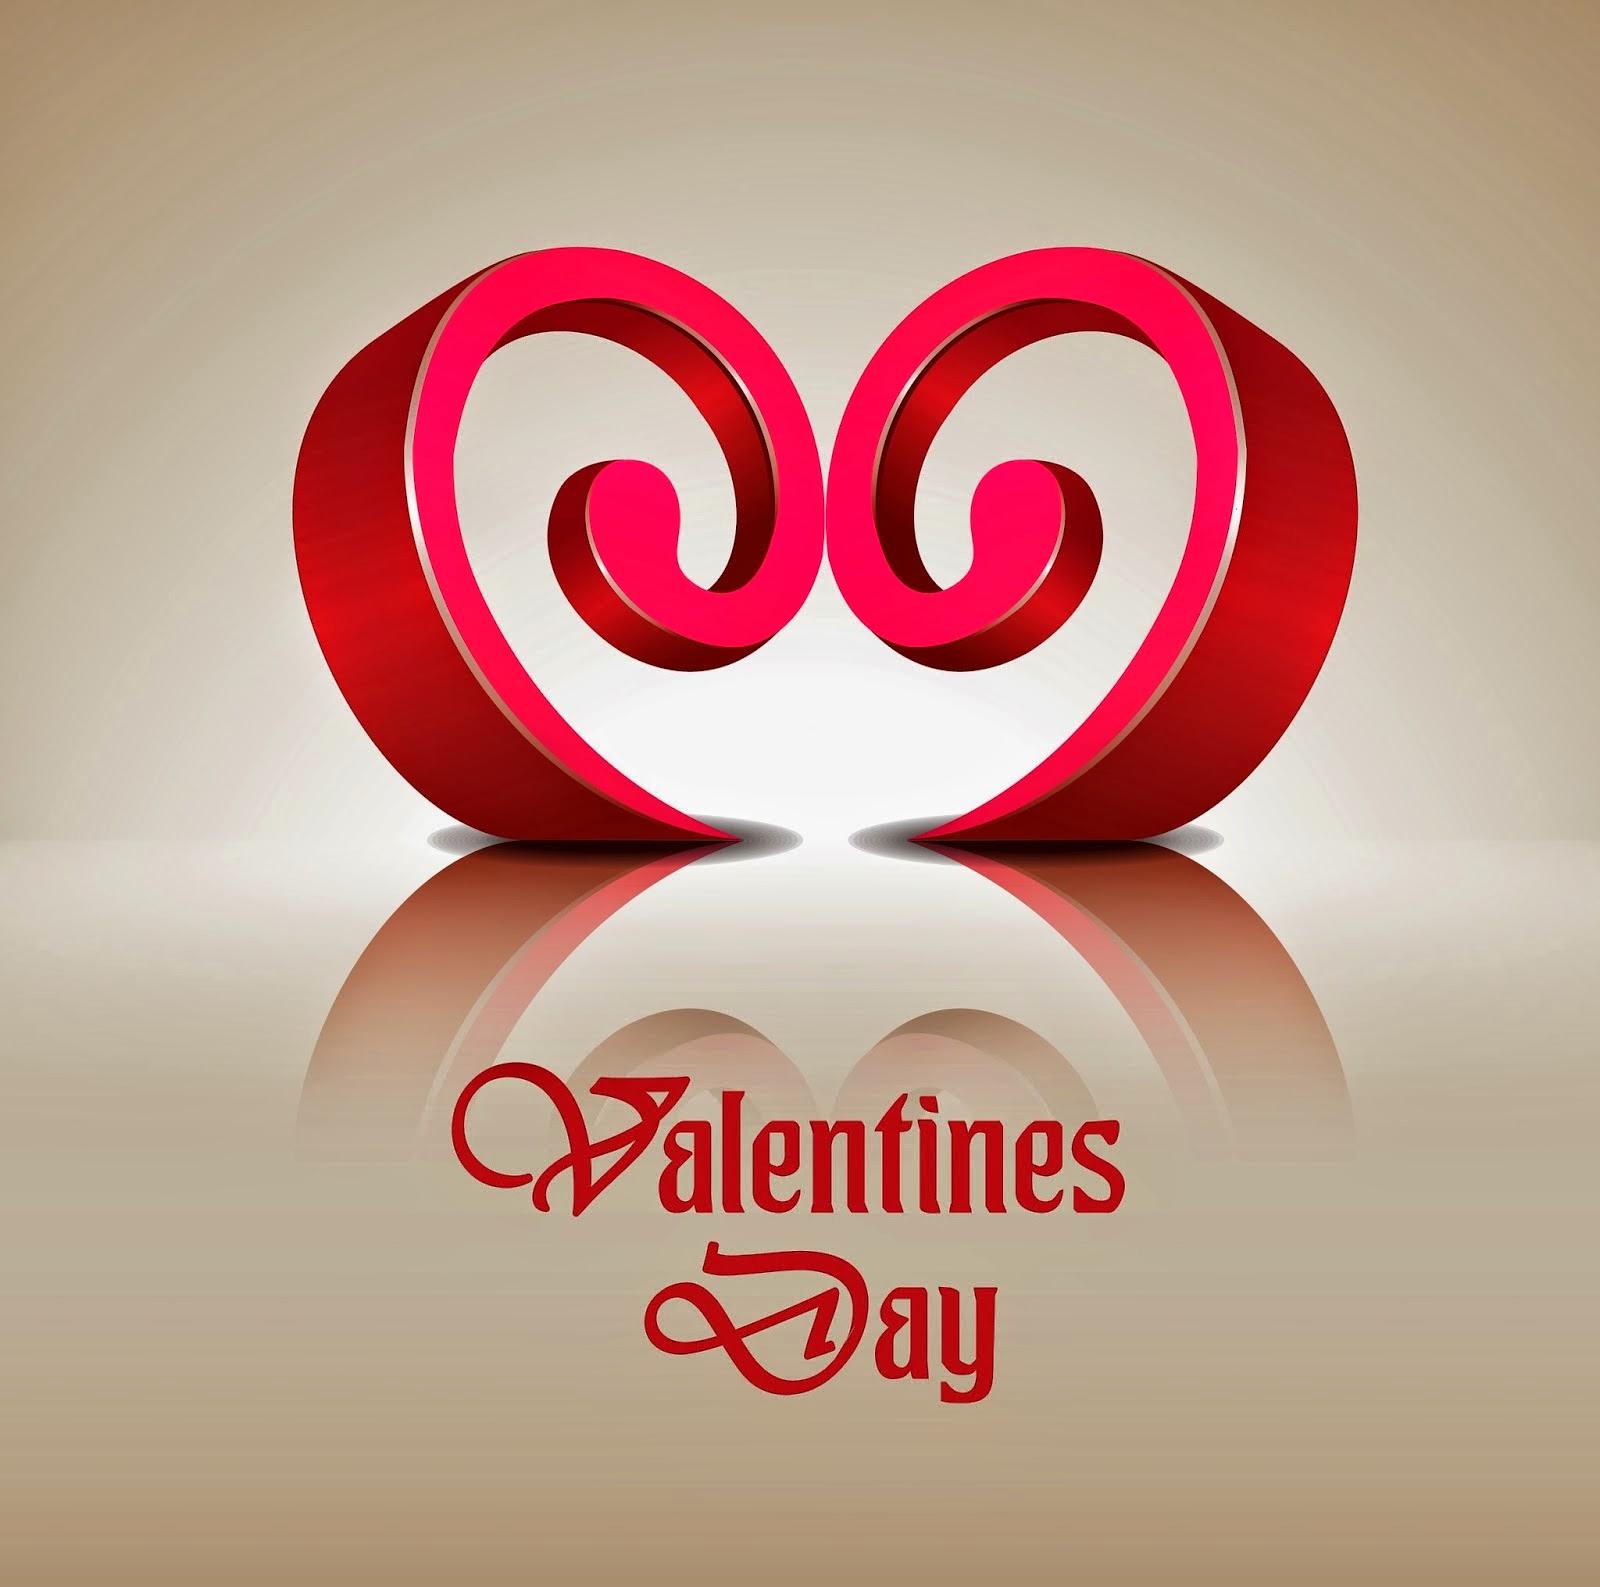 3D Valentines Day Wallpaper Download 3D Valentines Day 1600x1587